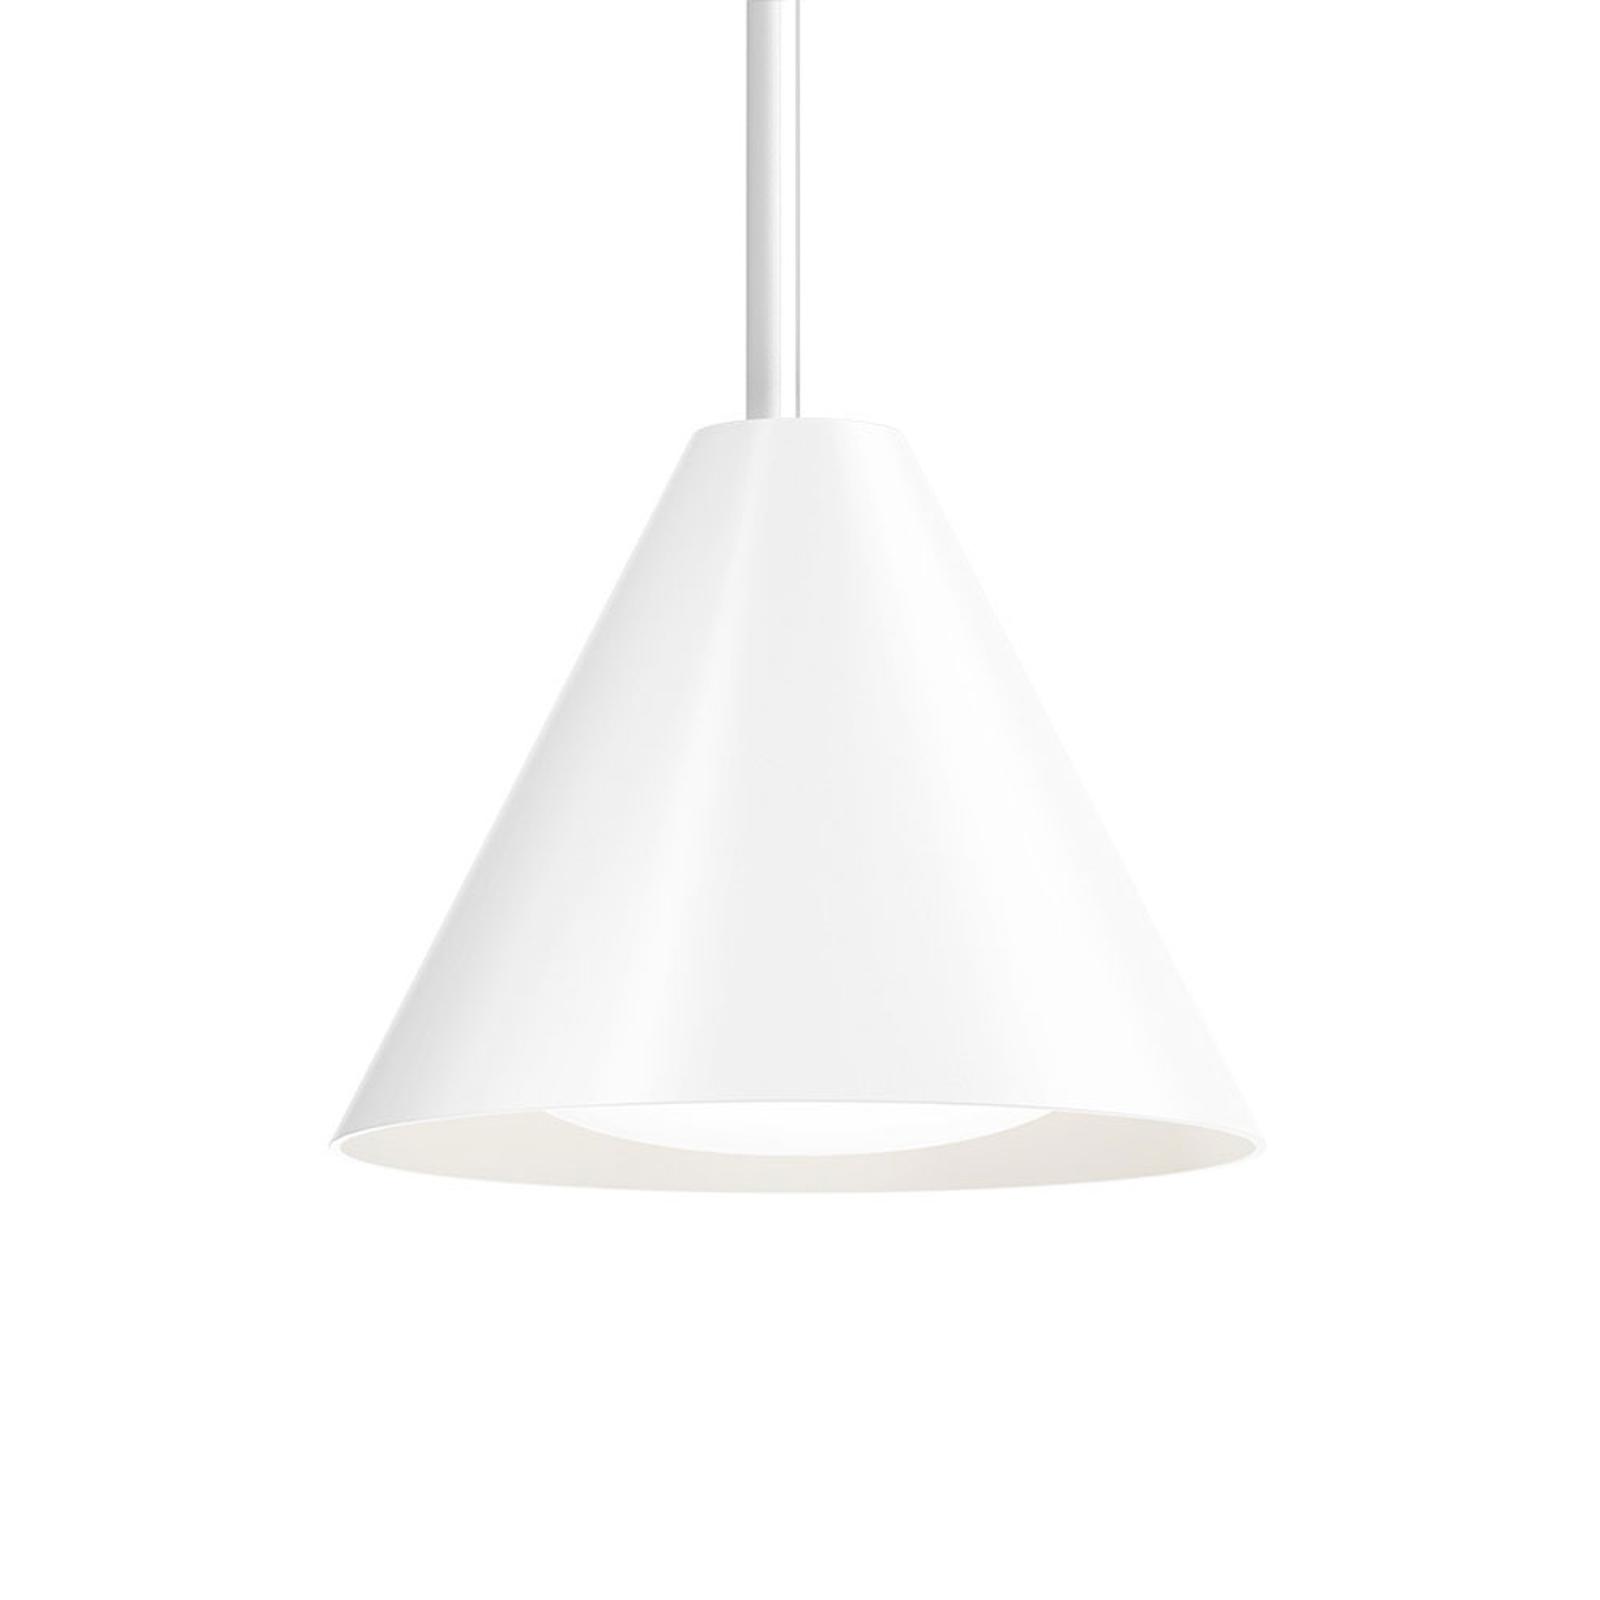 Louis Poulsen Keglen LED sospensione 17,5cm bianco